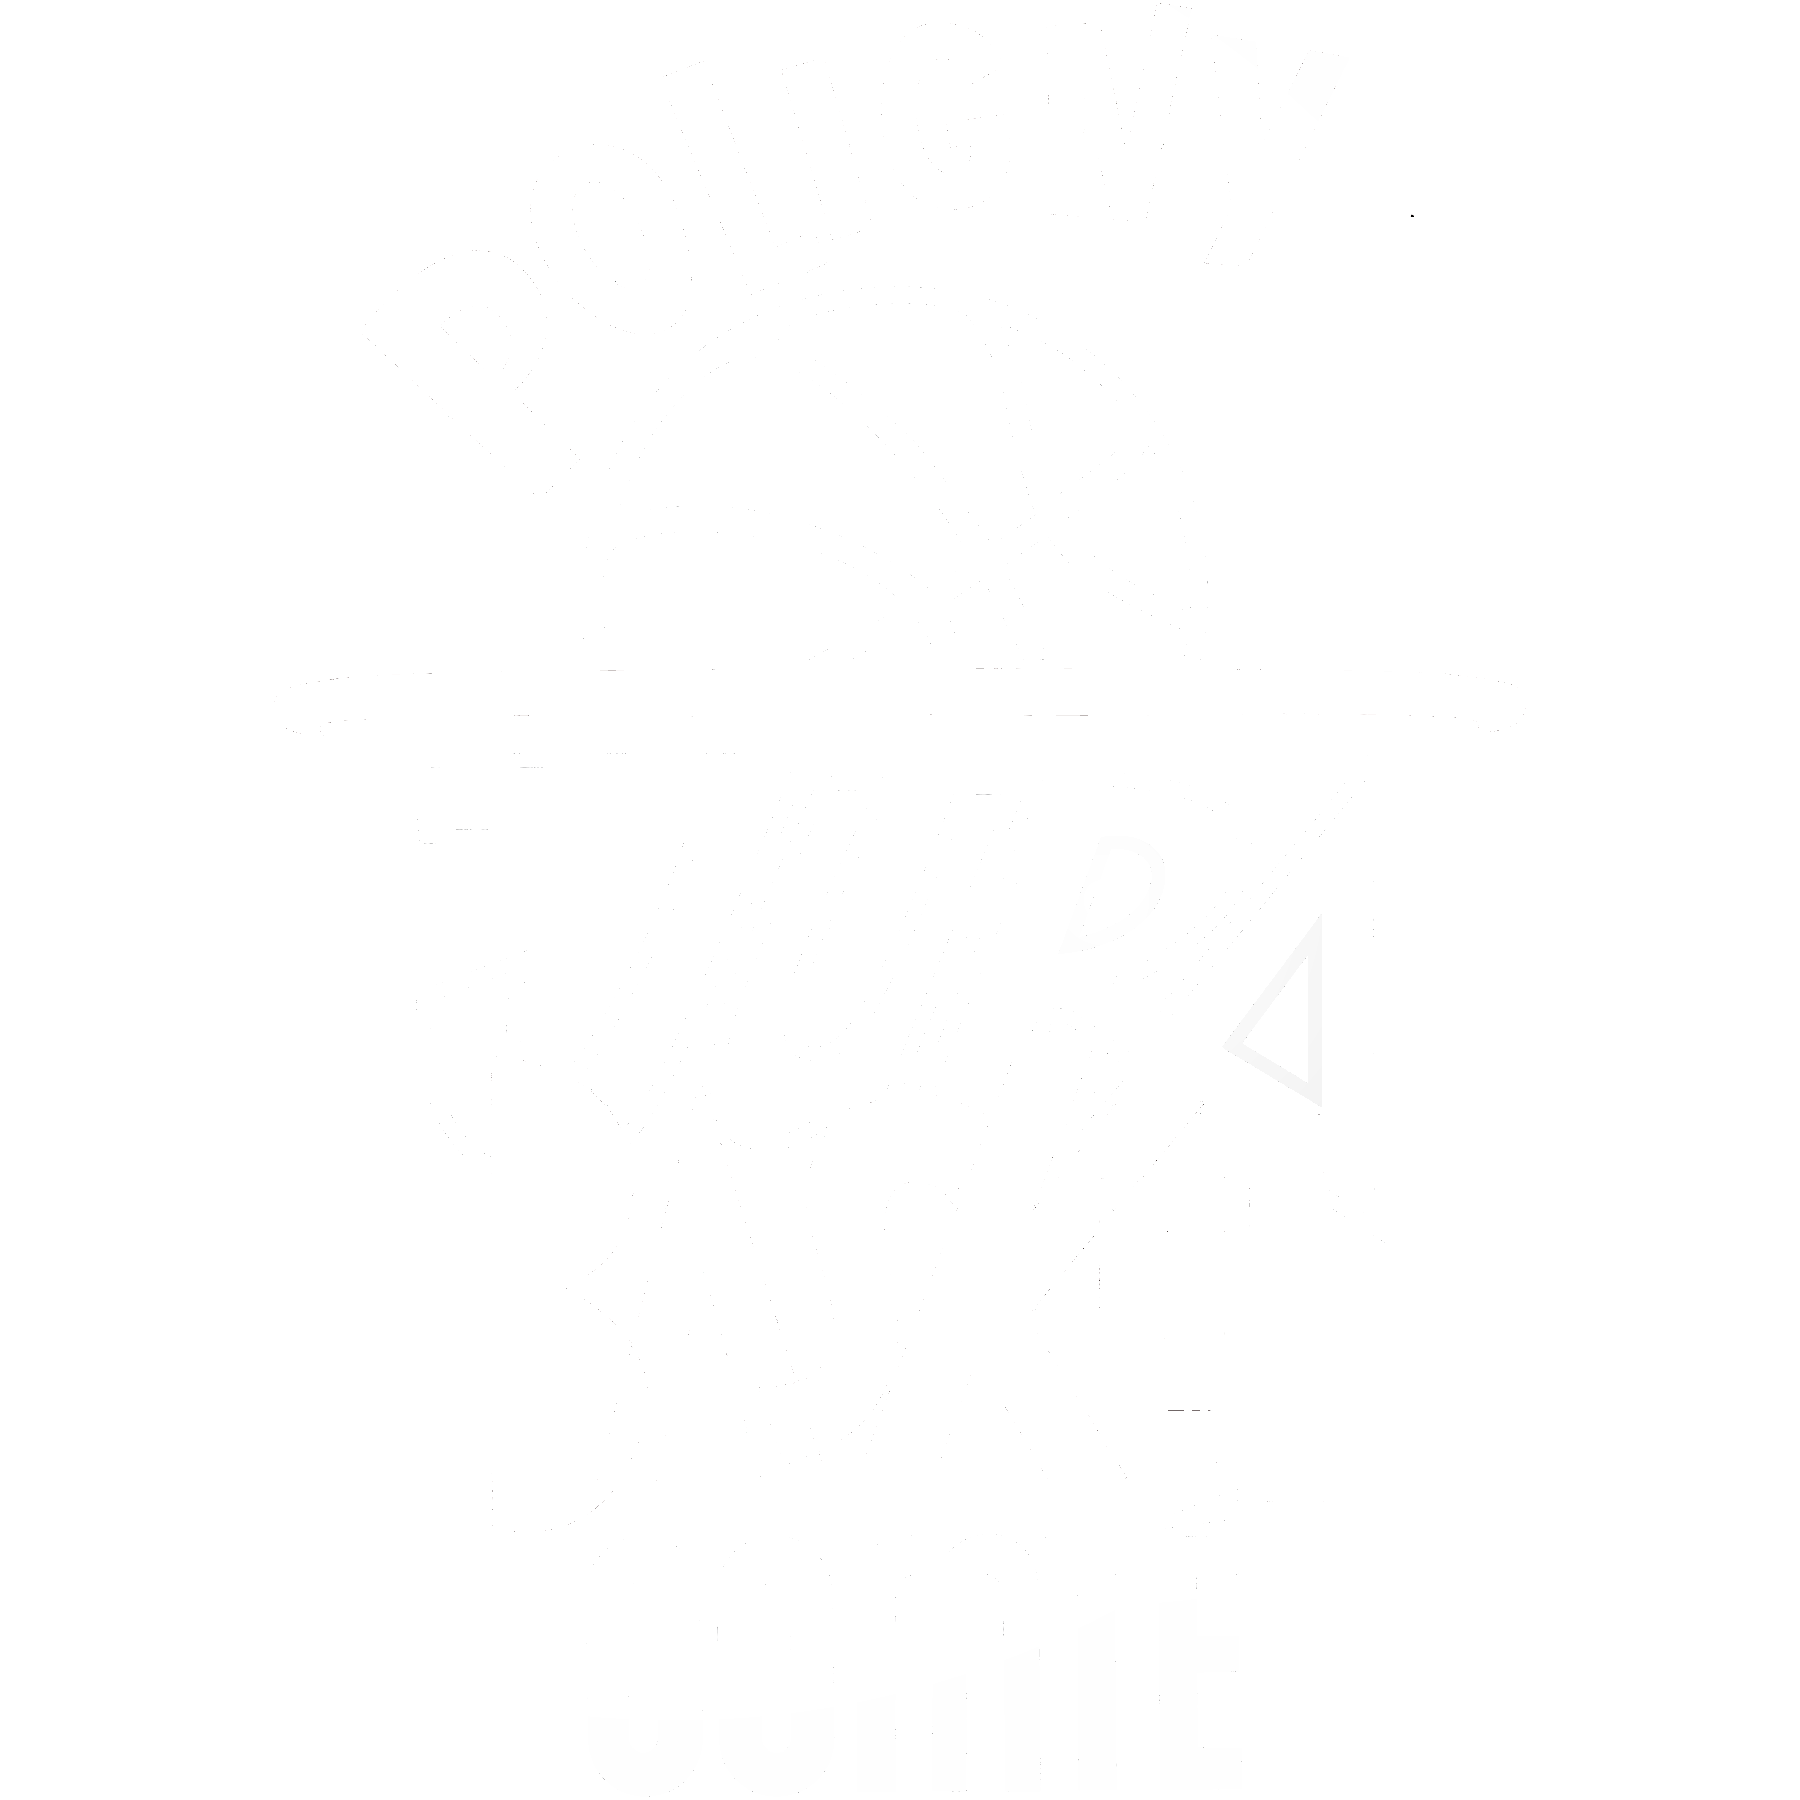 Poligny logo blanc